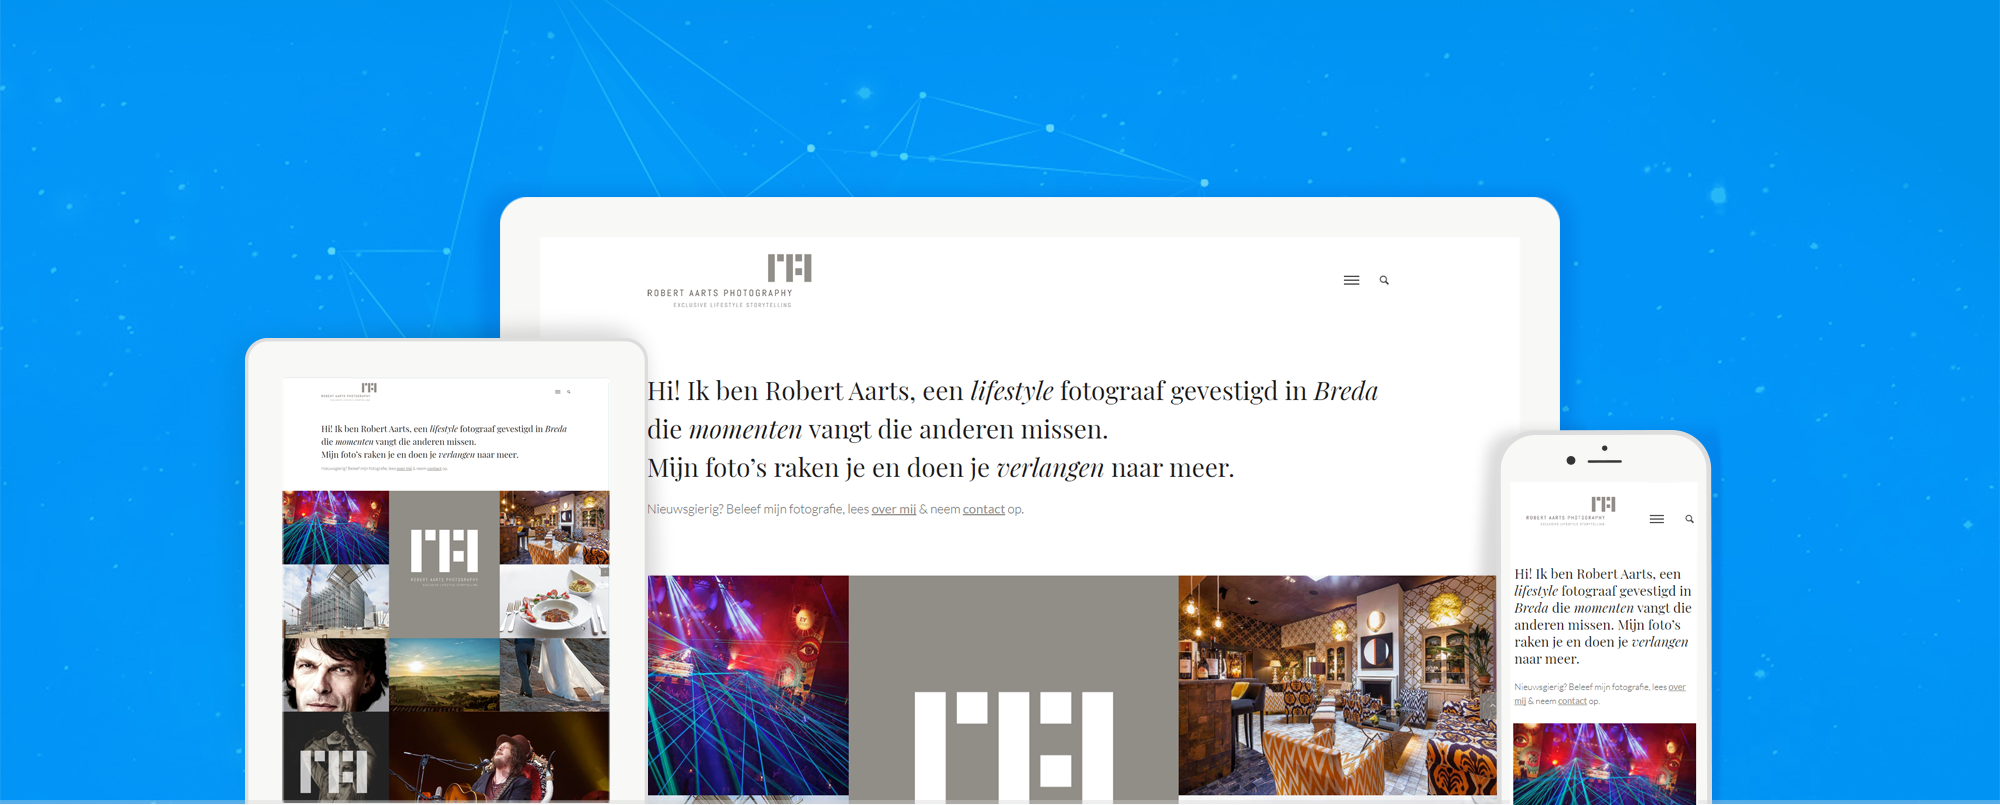 robertaarts.nl_